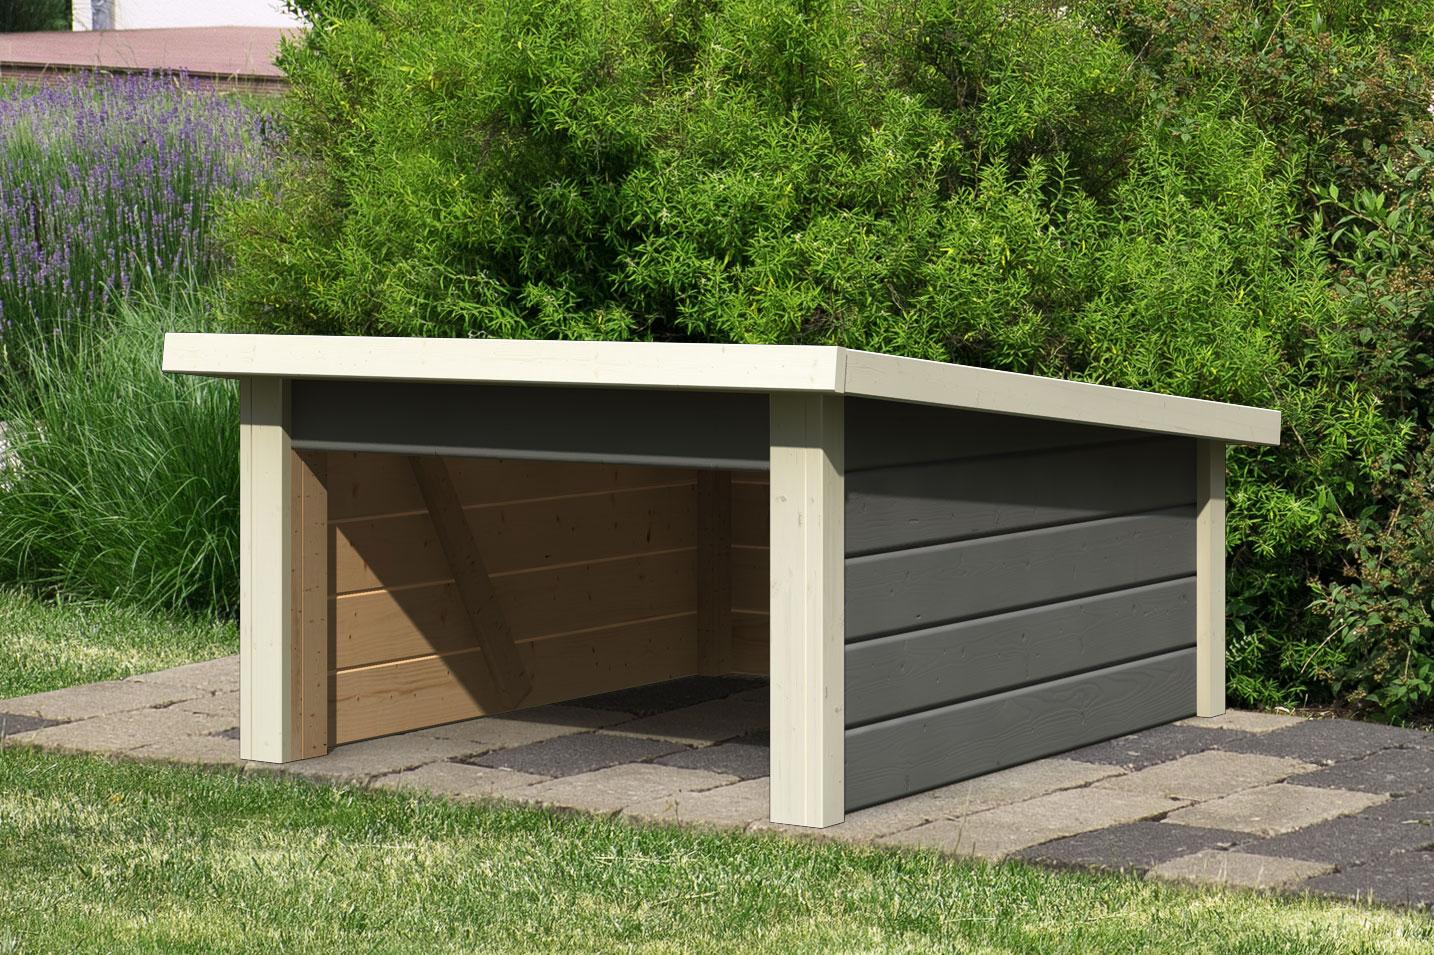 WoodFeeling Mähroboter Haus / Garage Pultdach 2 terragrau 79x96x57cm Bild 1